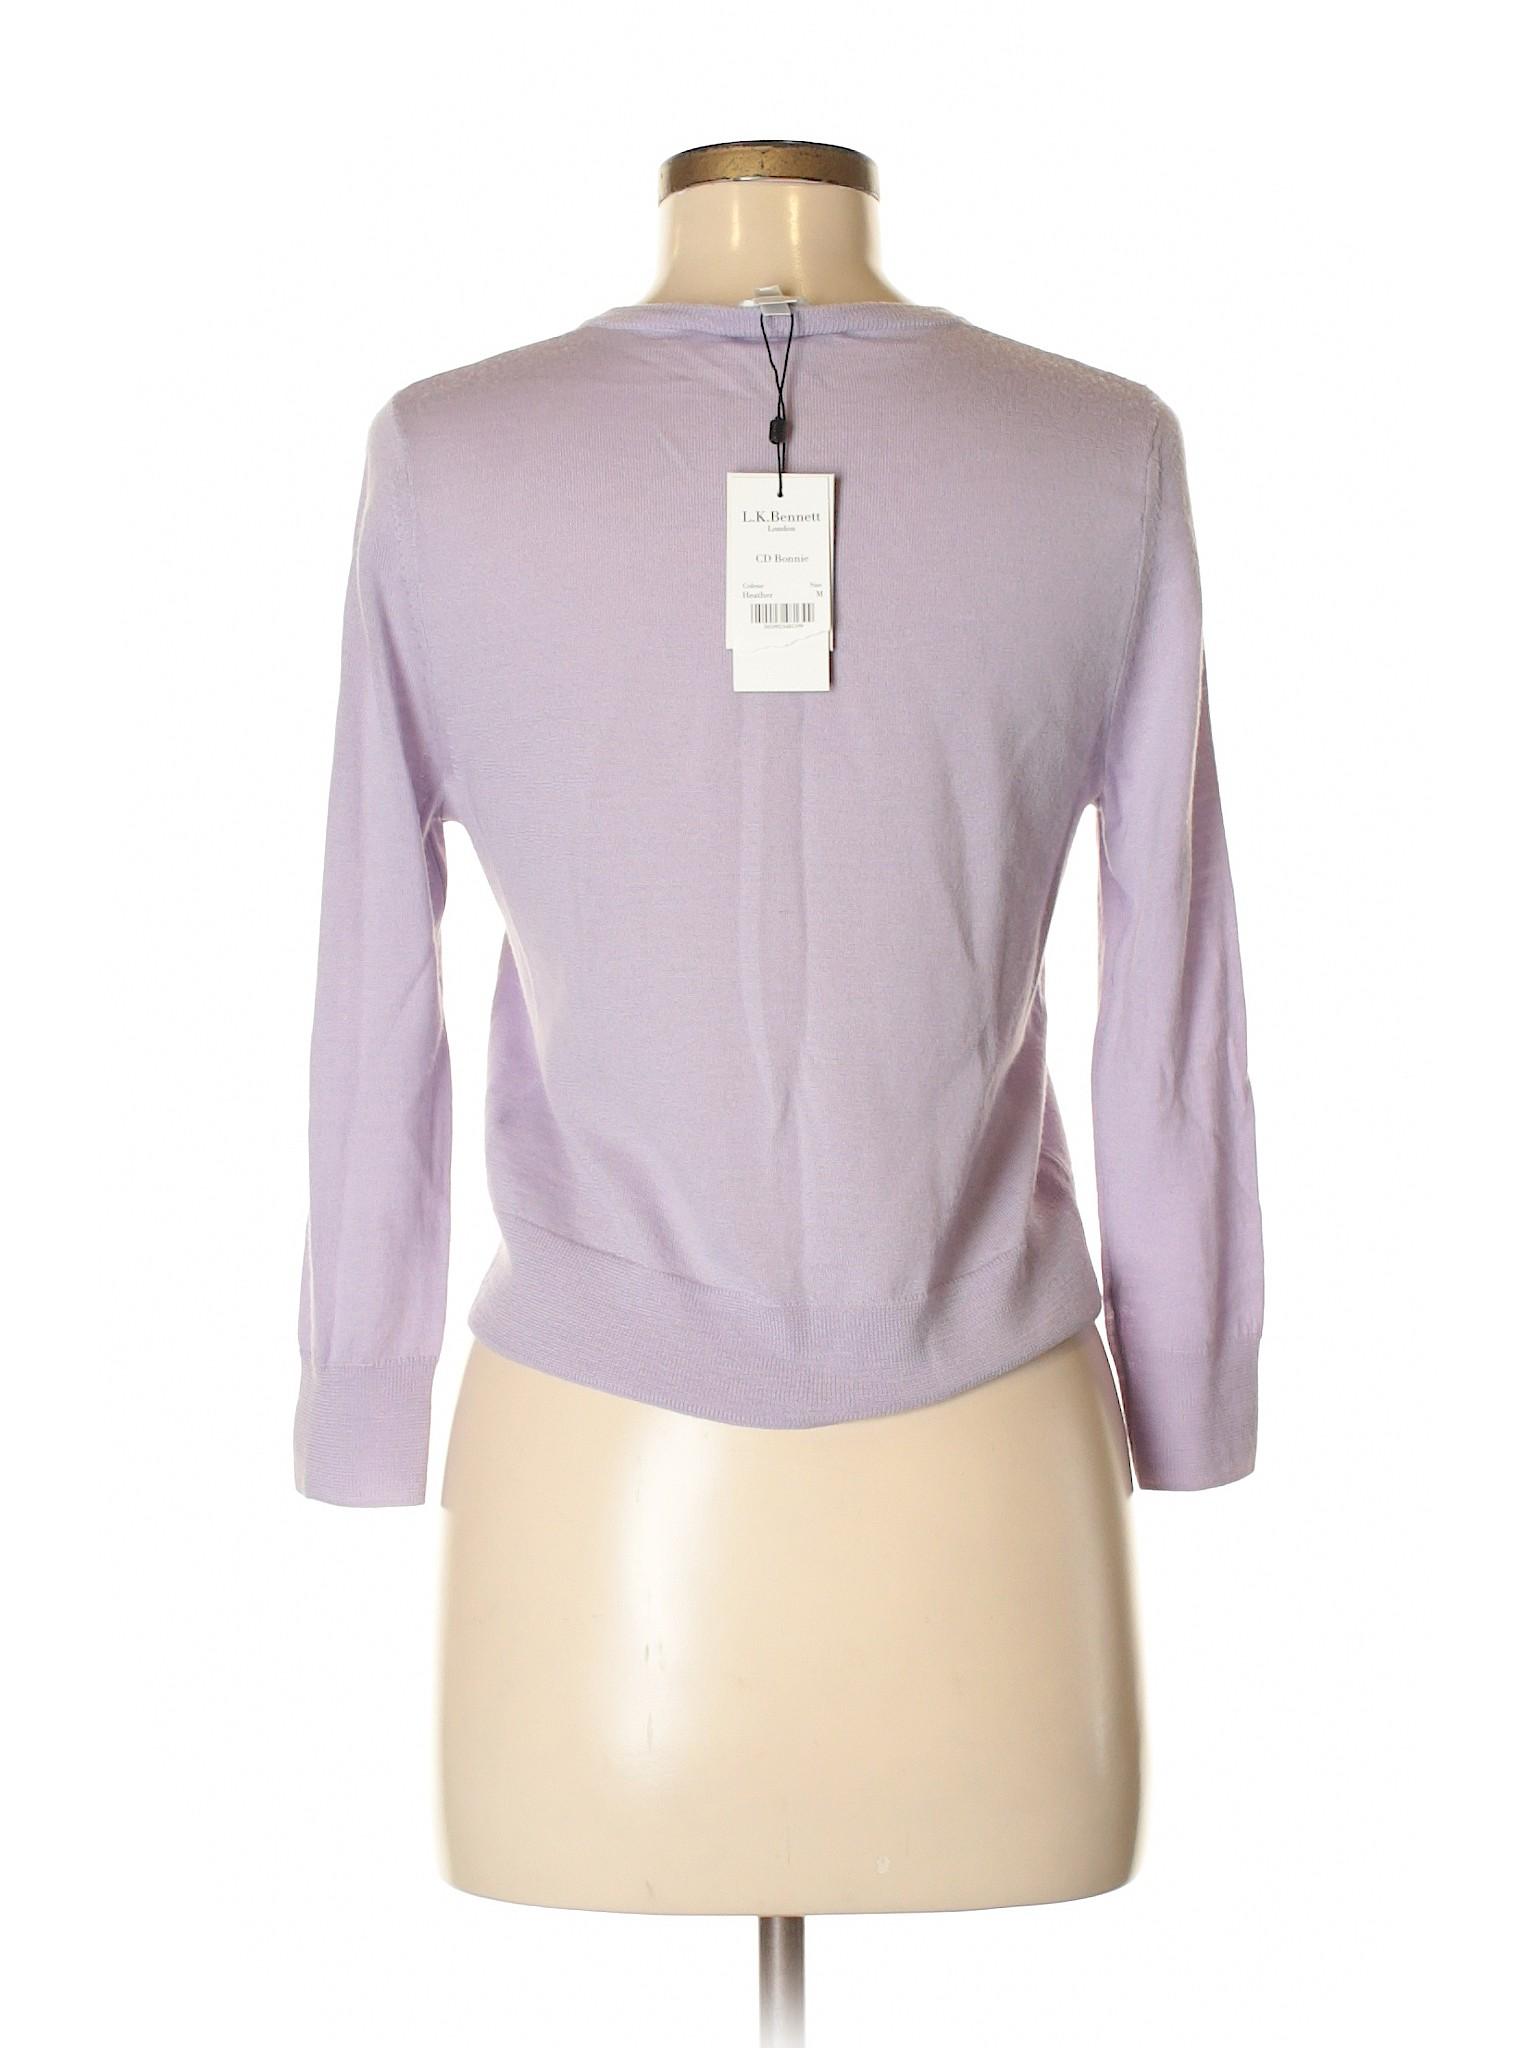 Boutique Wool Bennett K L Cardigan 8q8HO